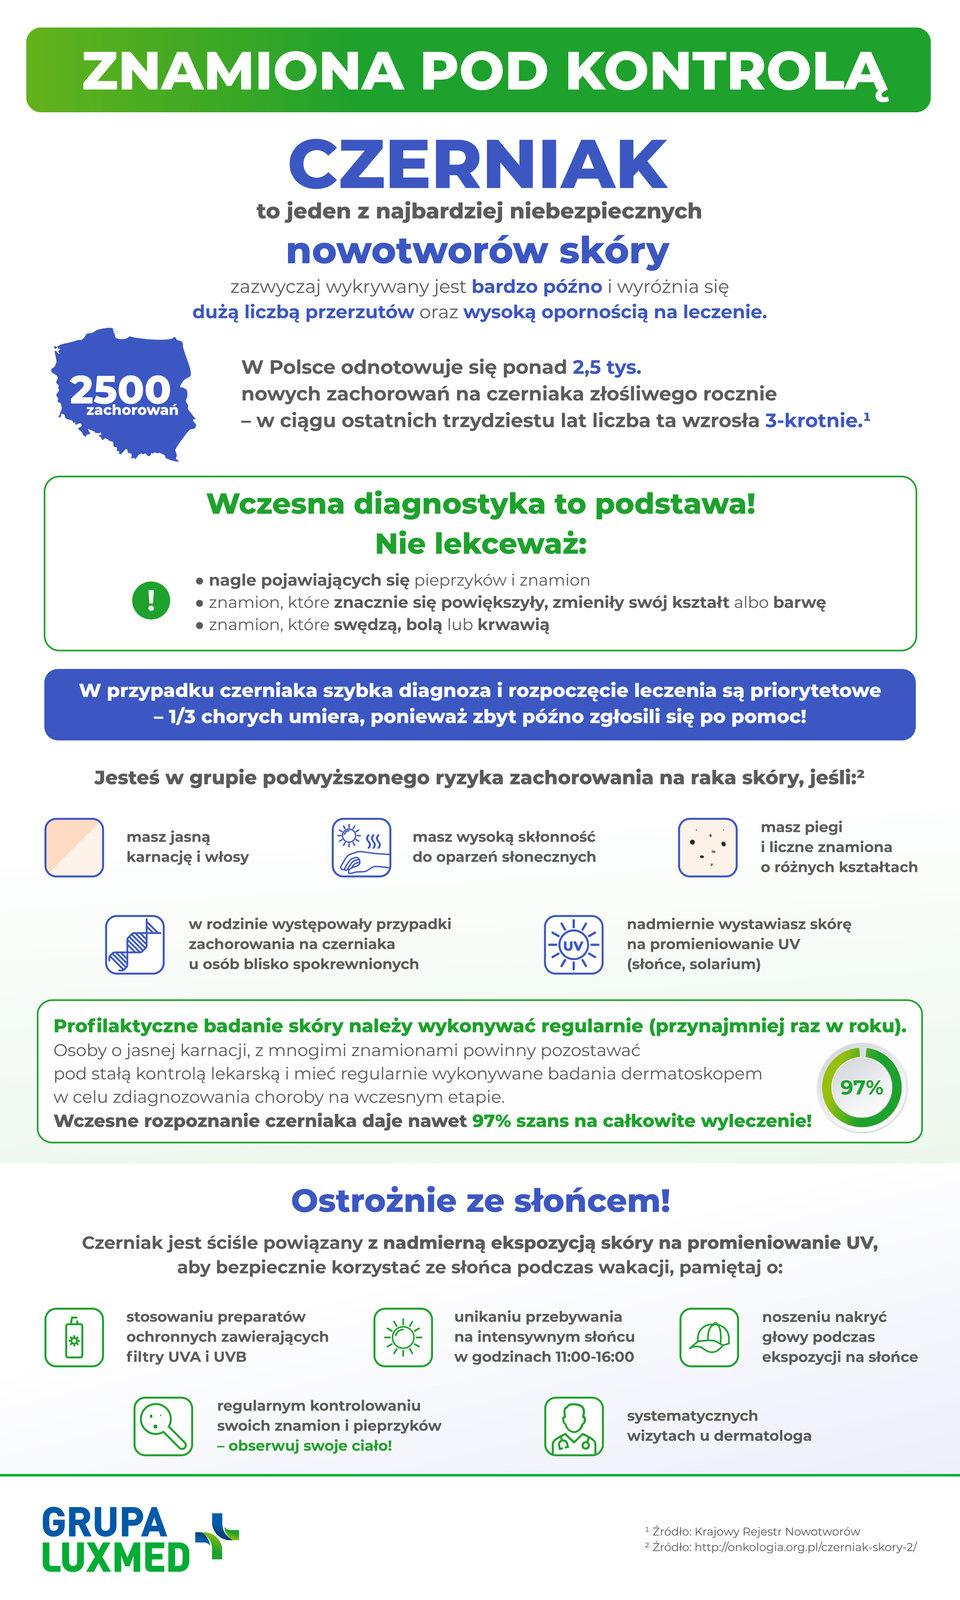 LUXMED_Znamiona_pod_kontrola_infografika_JPG.jpg